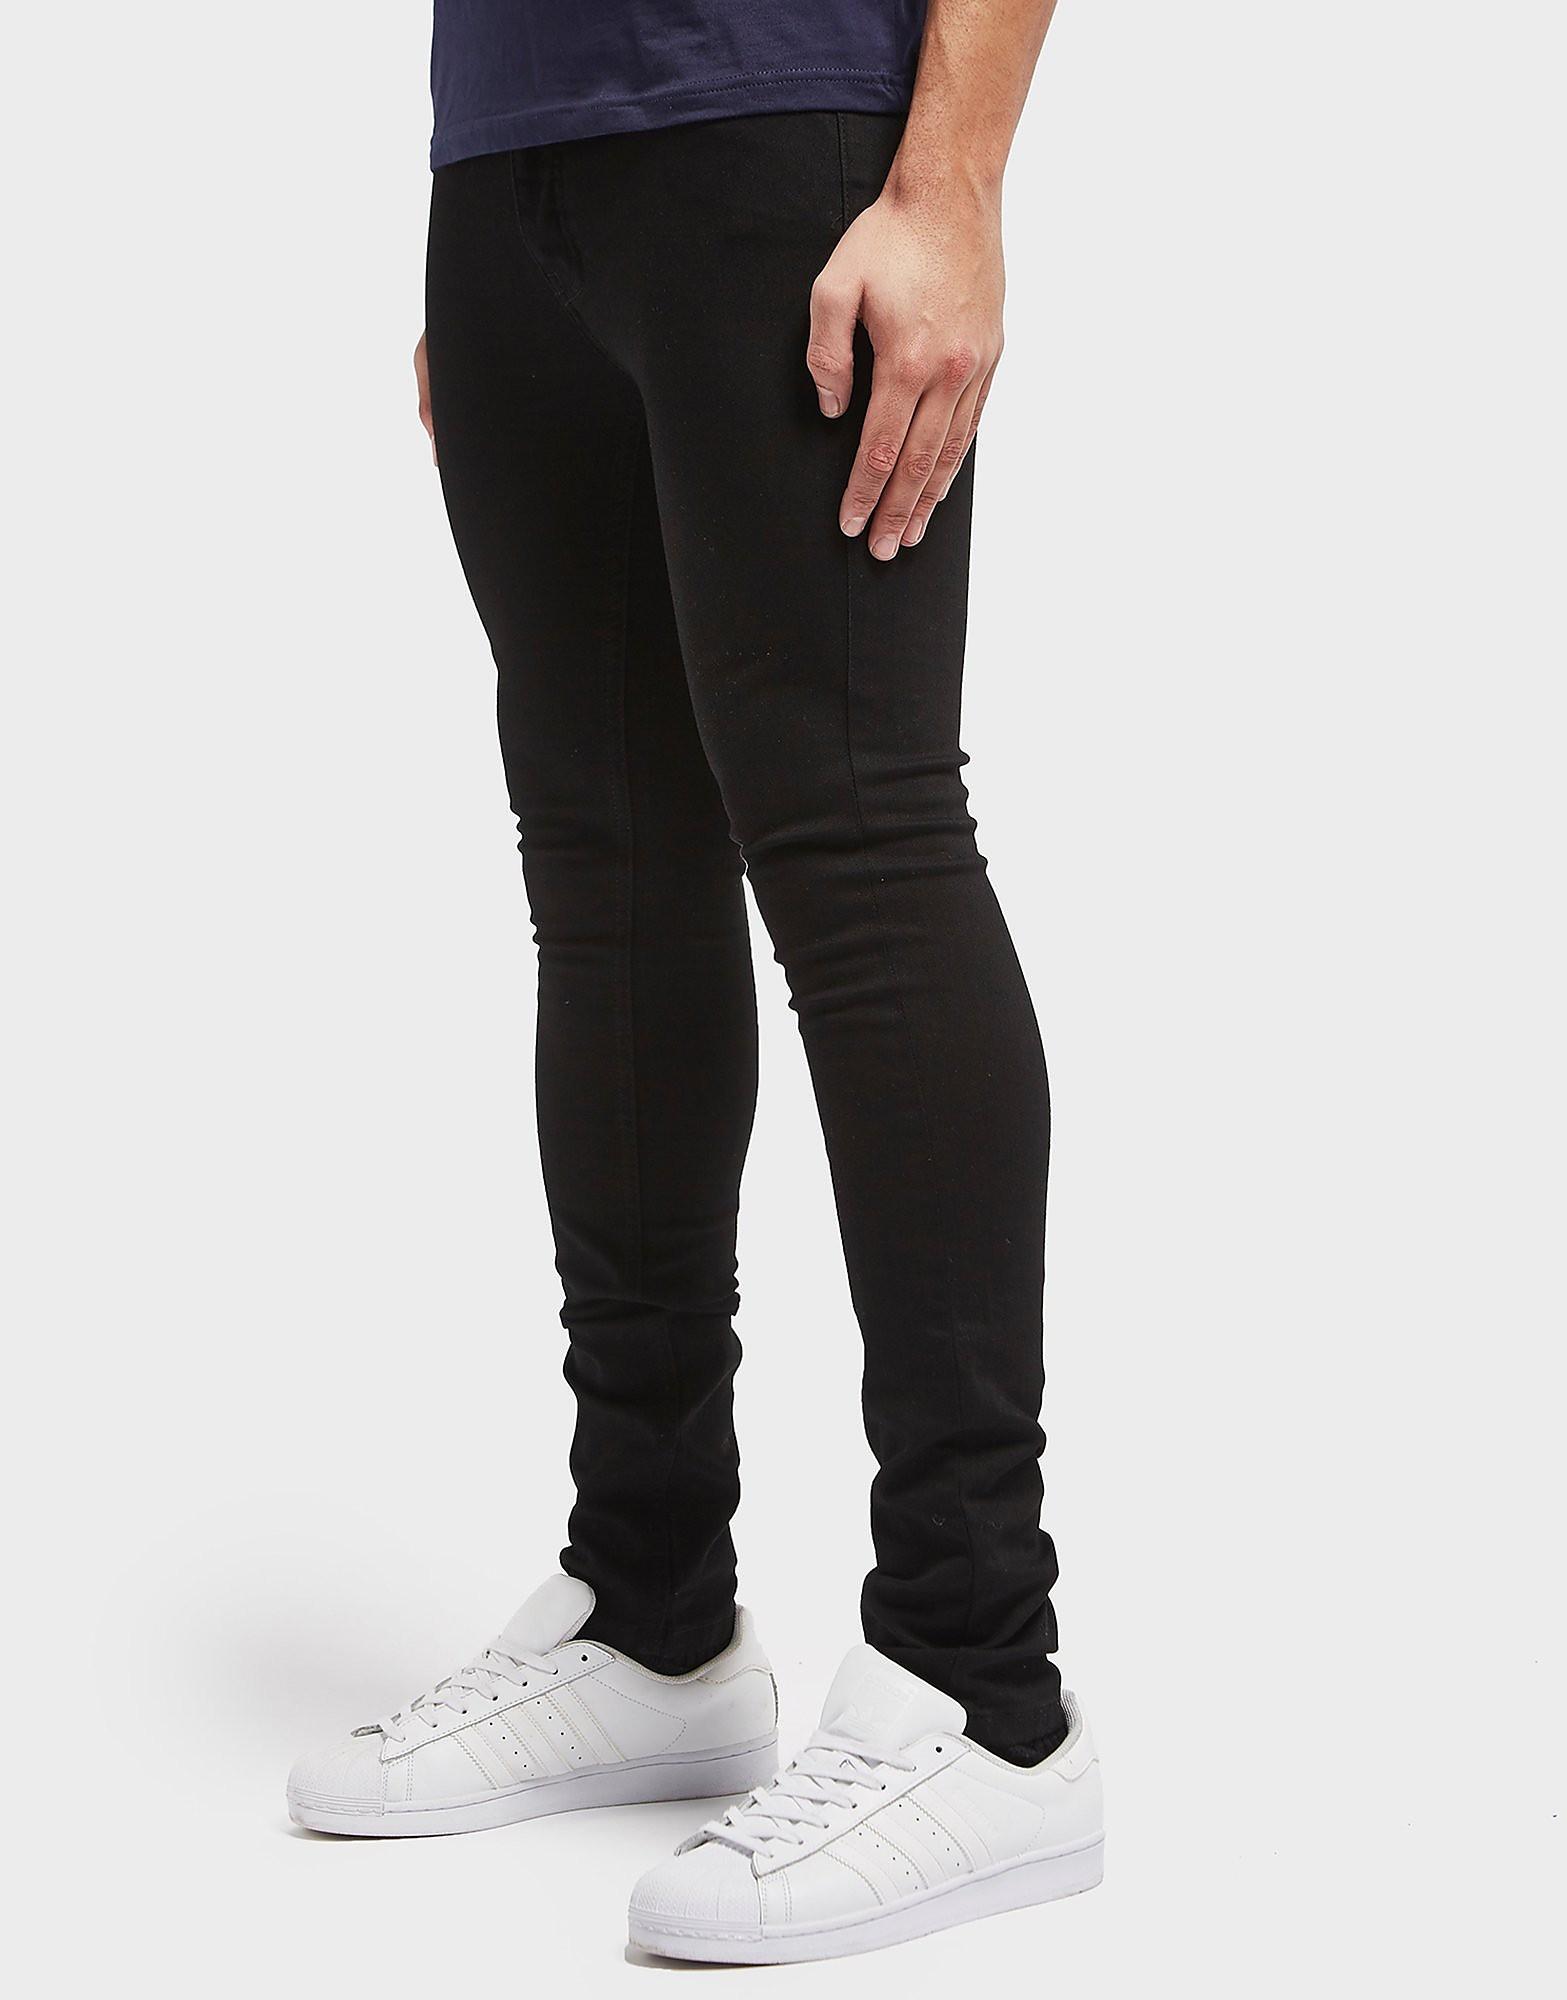 One True Saxon Black Skinny Jeans - Exclusive